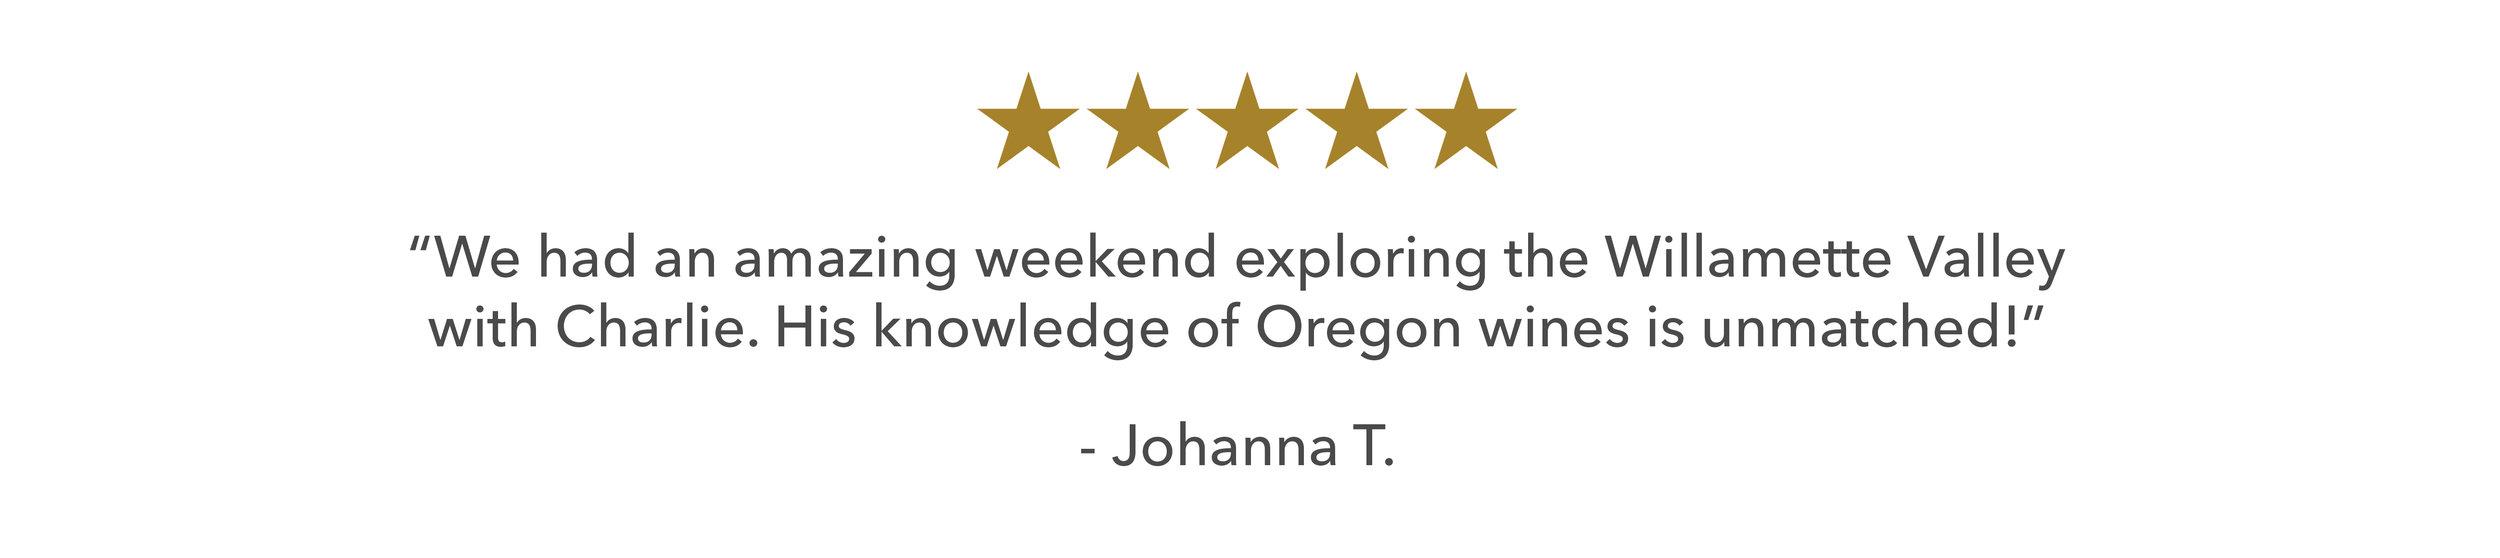 Oregon Wine Guide Reviews_5.jpg